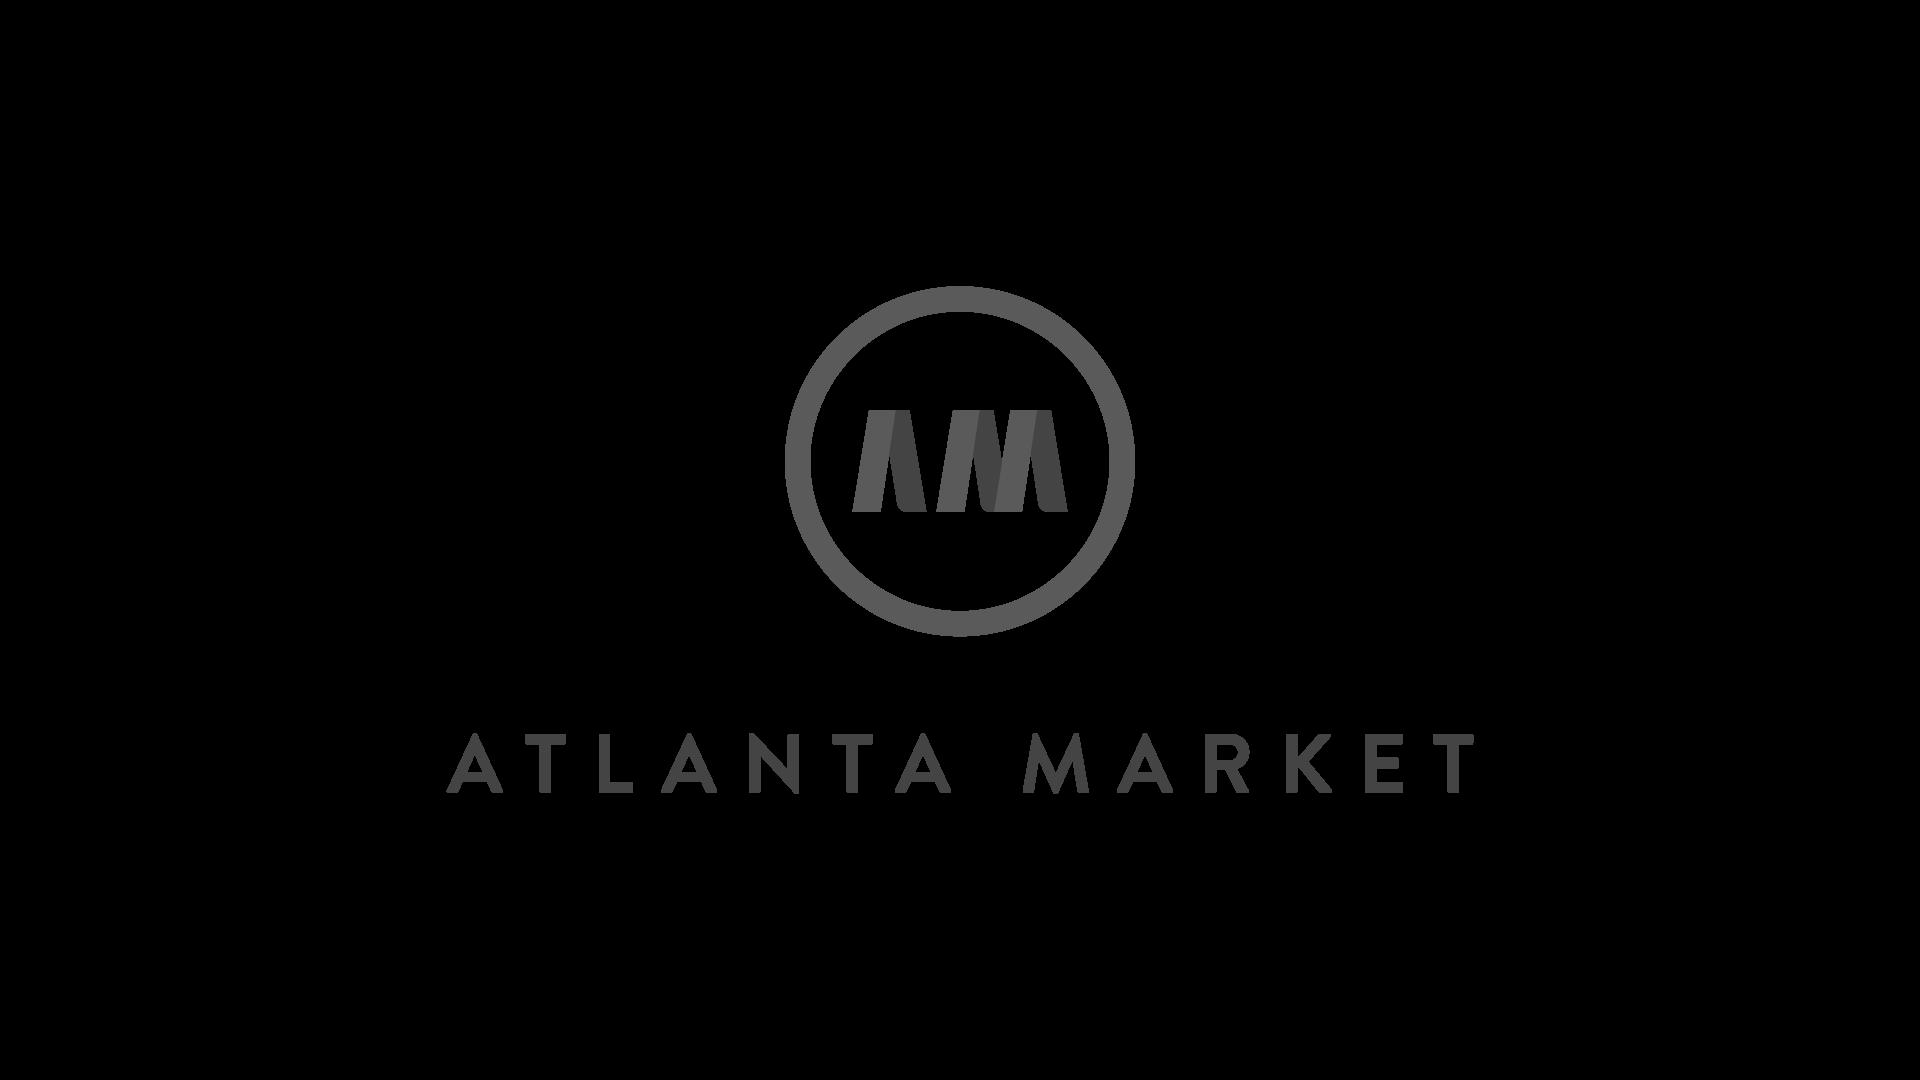 Atlanta Market - Dark Greyscale Logo